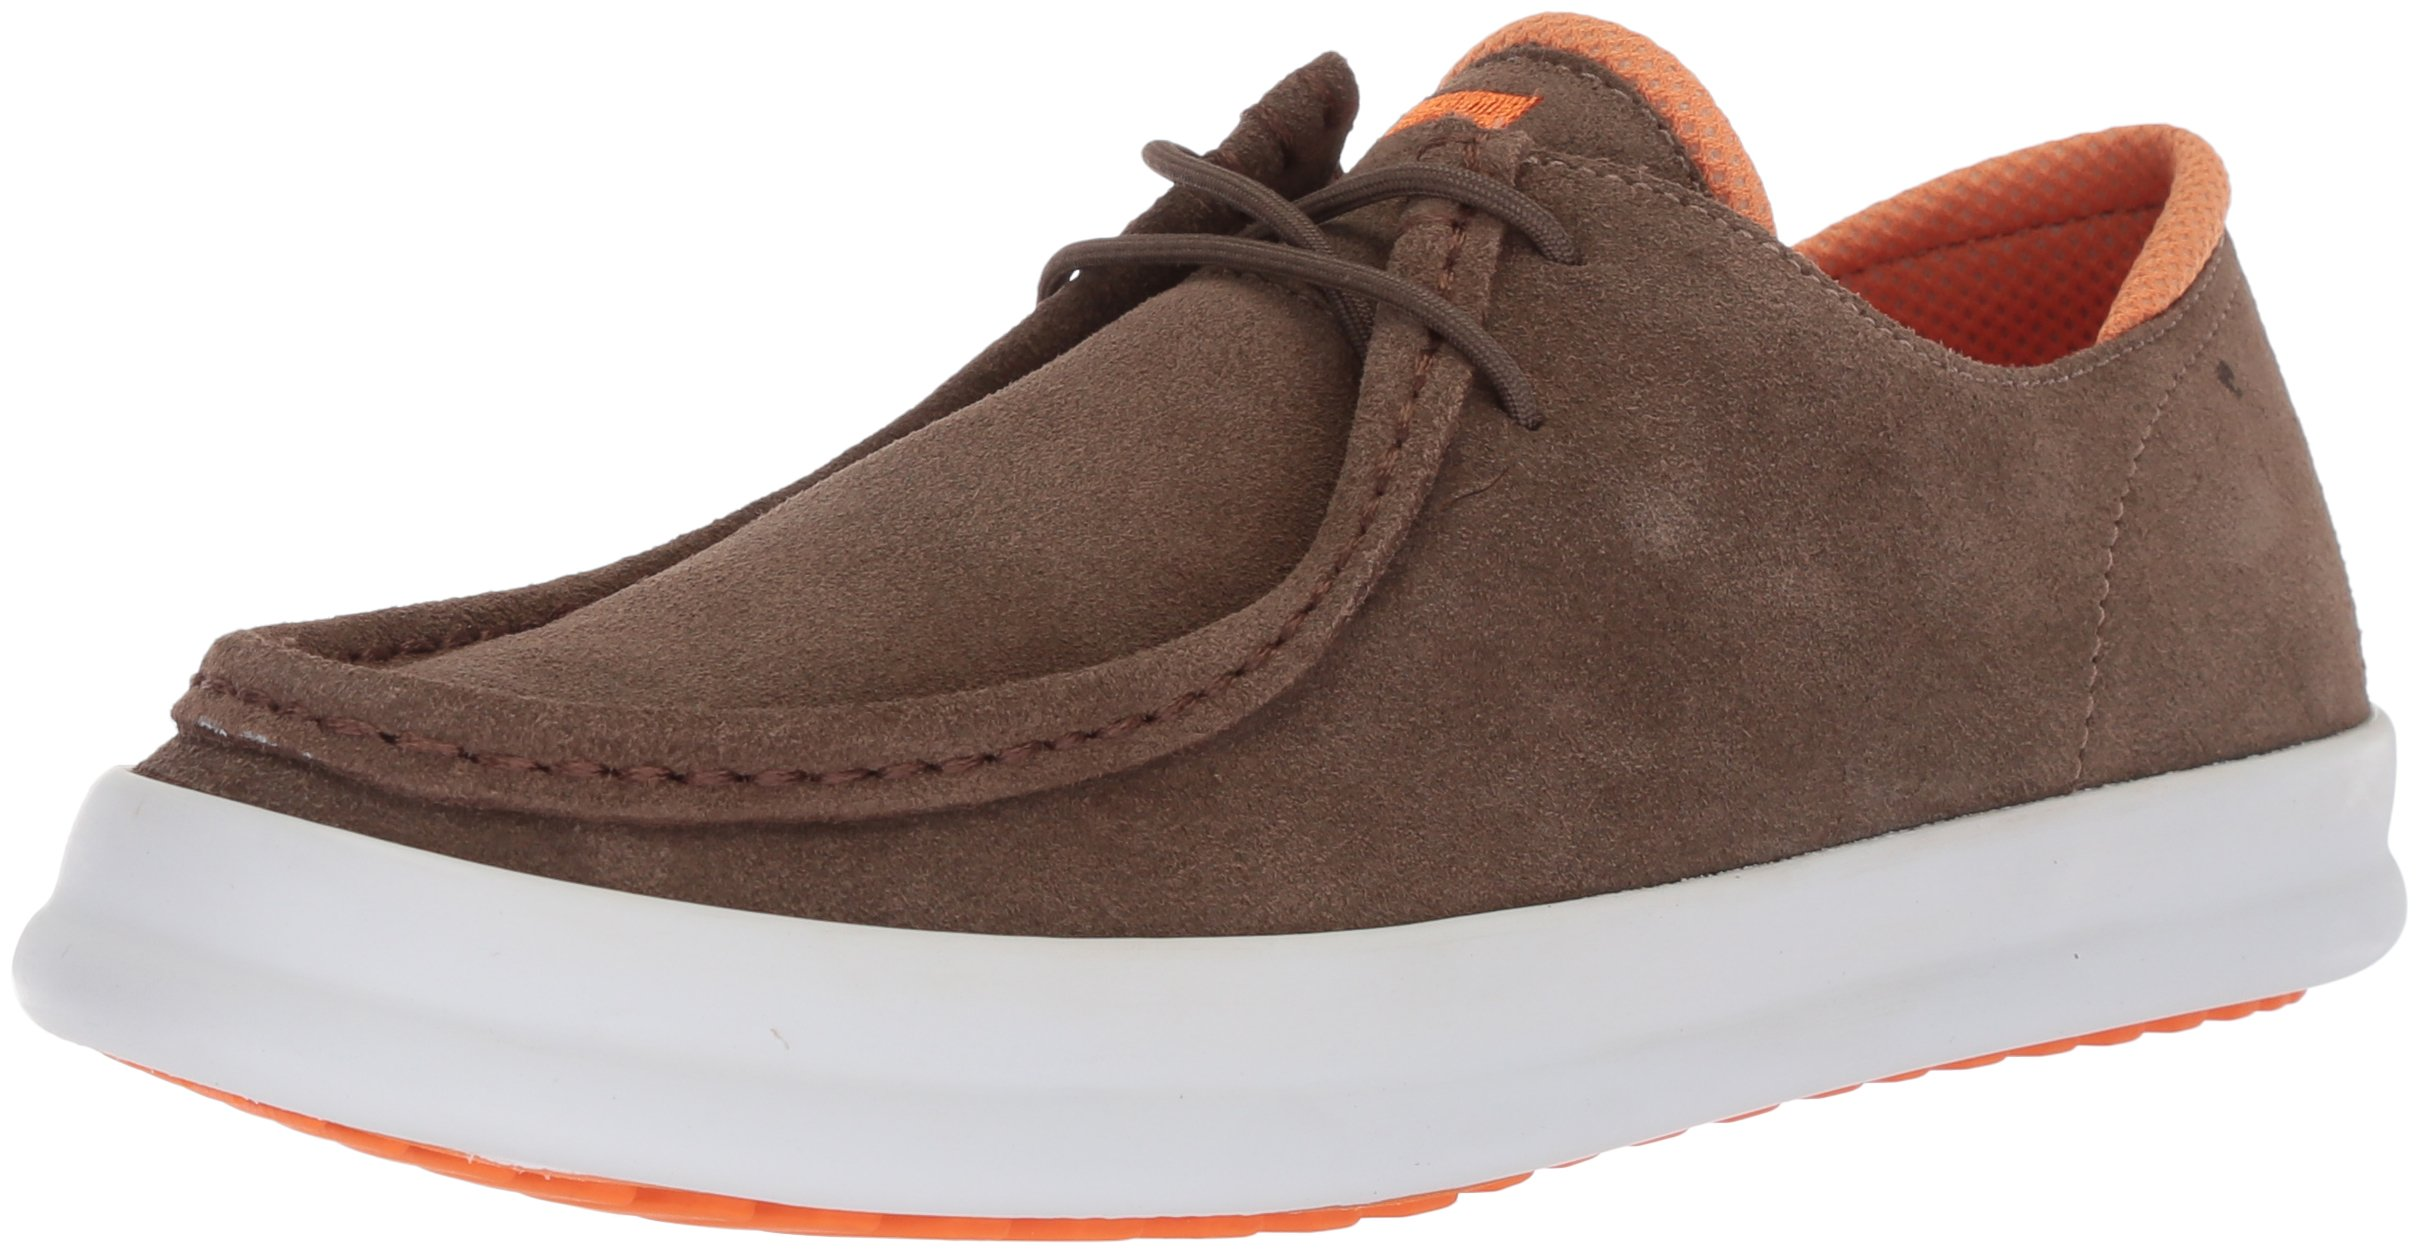 Camper Men's Chasis K100282 Sneaker, Beige, 42 M EU (9 US)